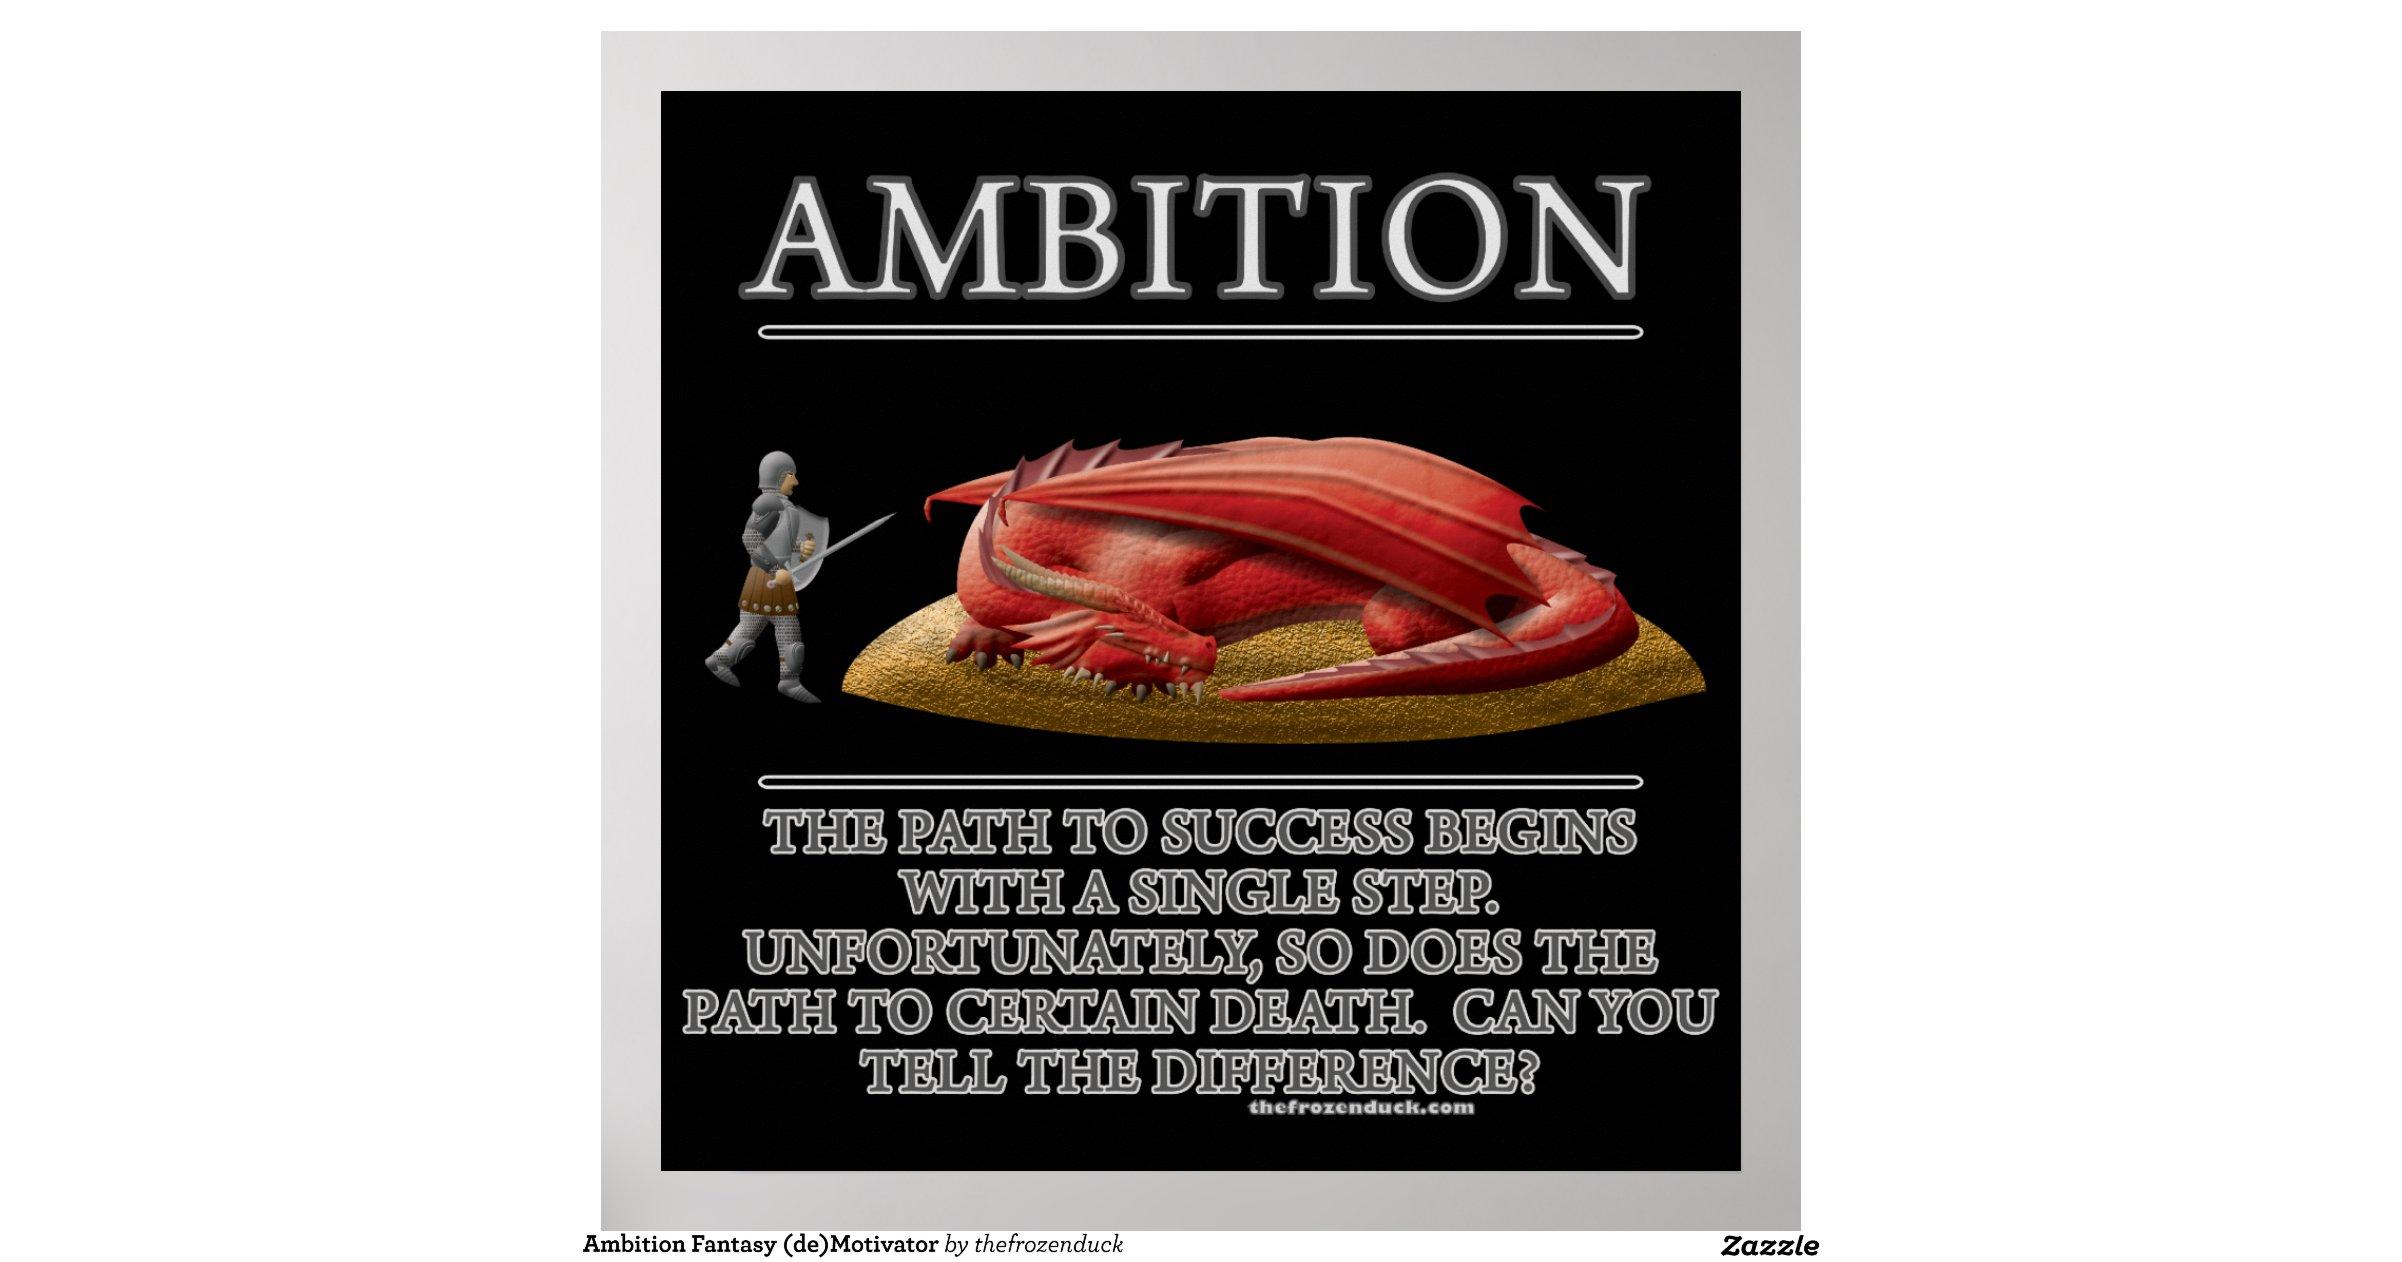 ambition_fantasy_de_motivator_poster ...